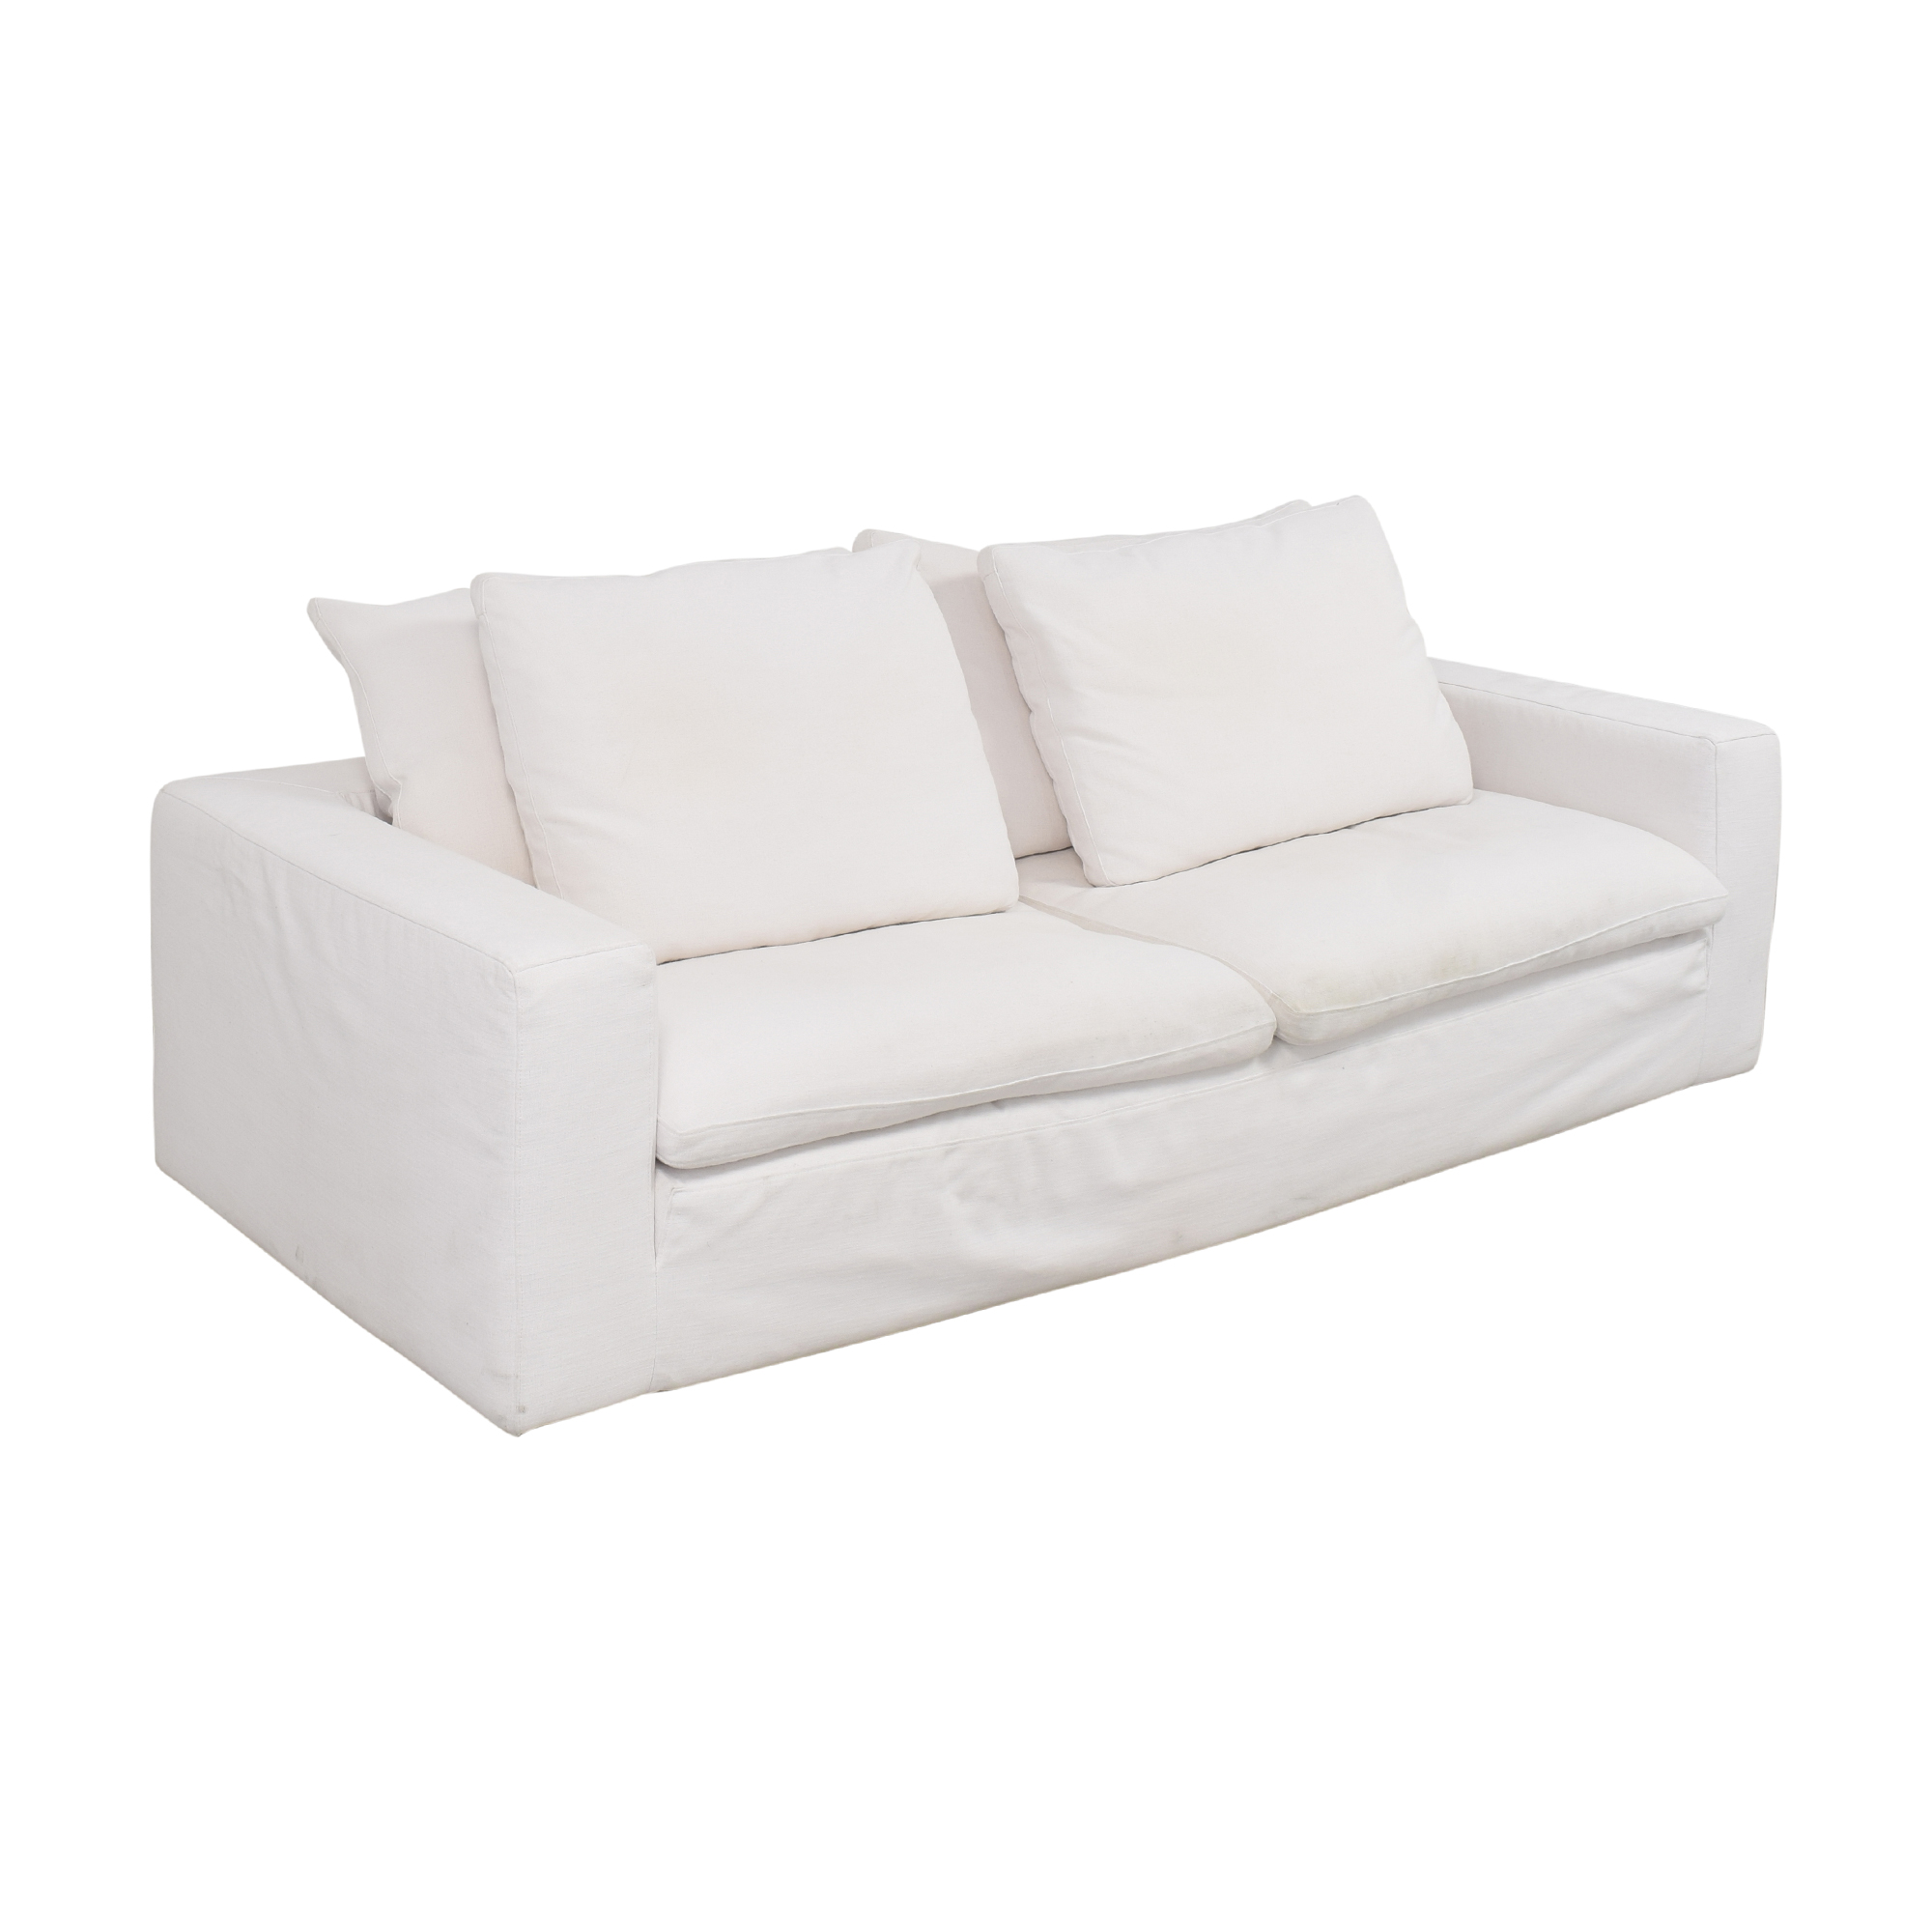 Restoration Hardware Restoration Hardware Cloud Two-Seat-Cushion Sofa Classic Sofas